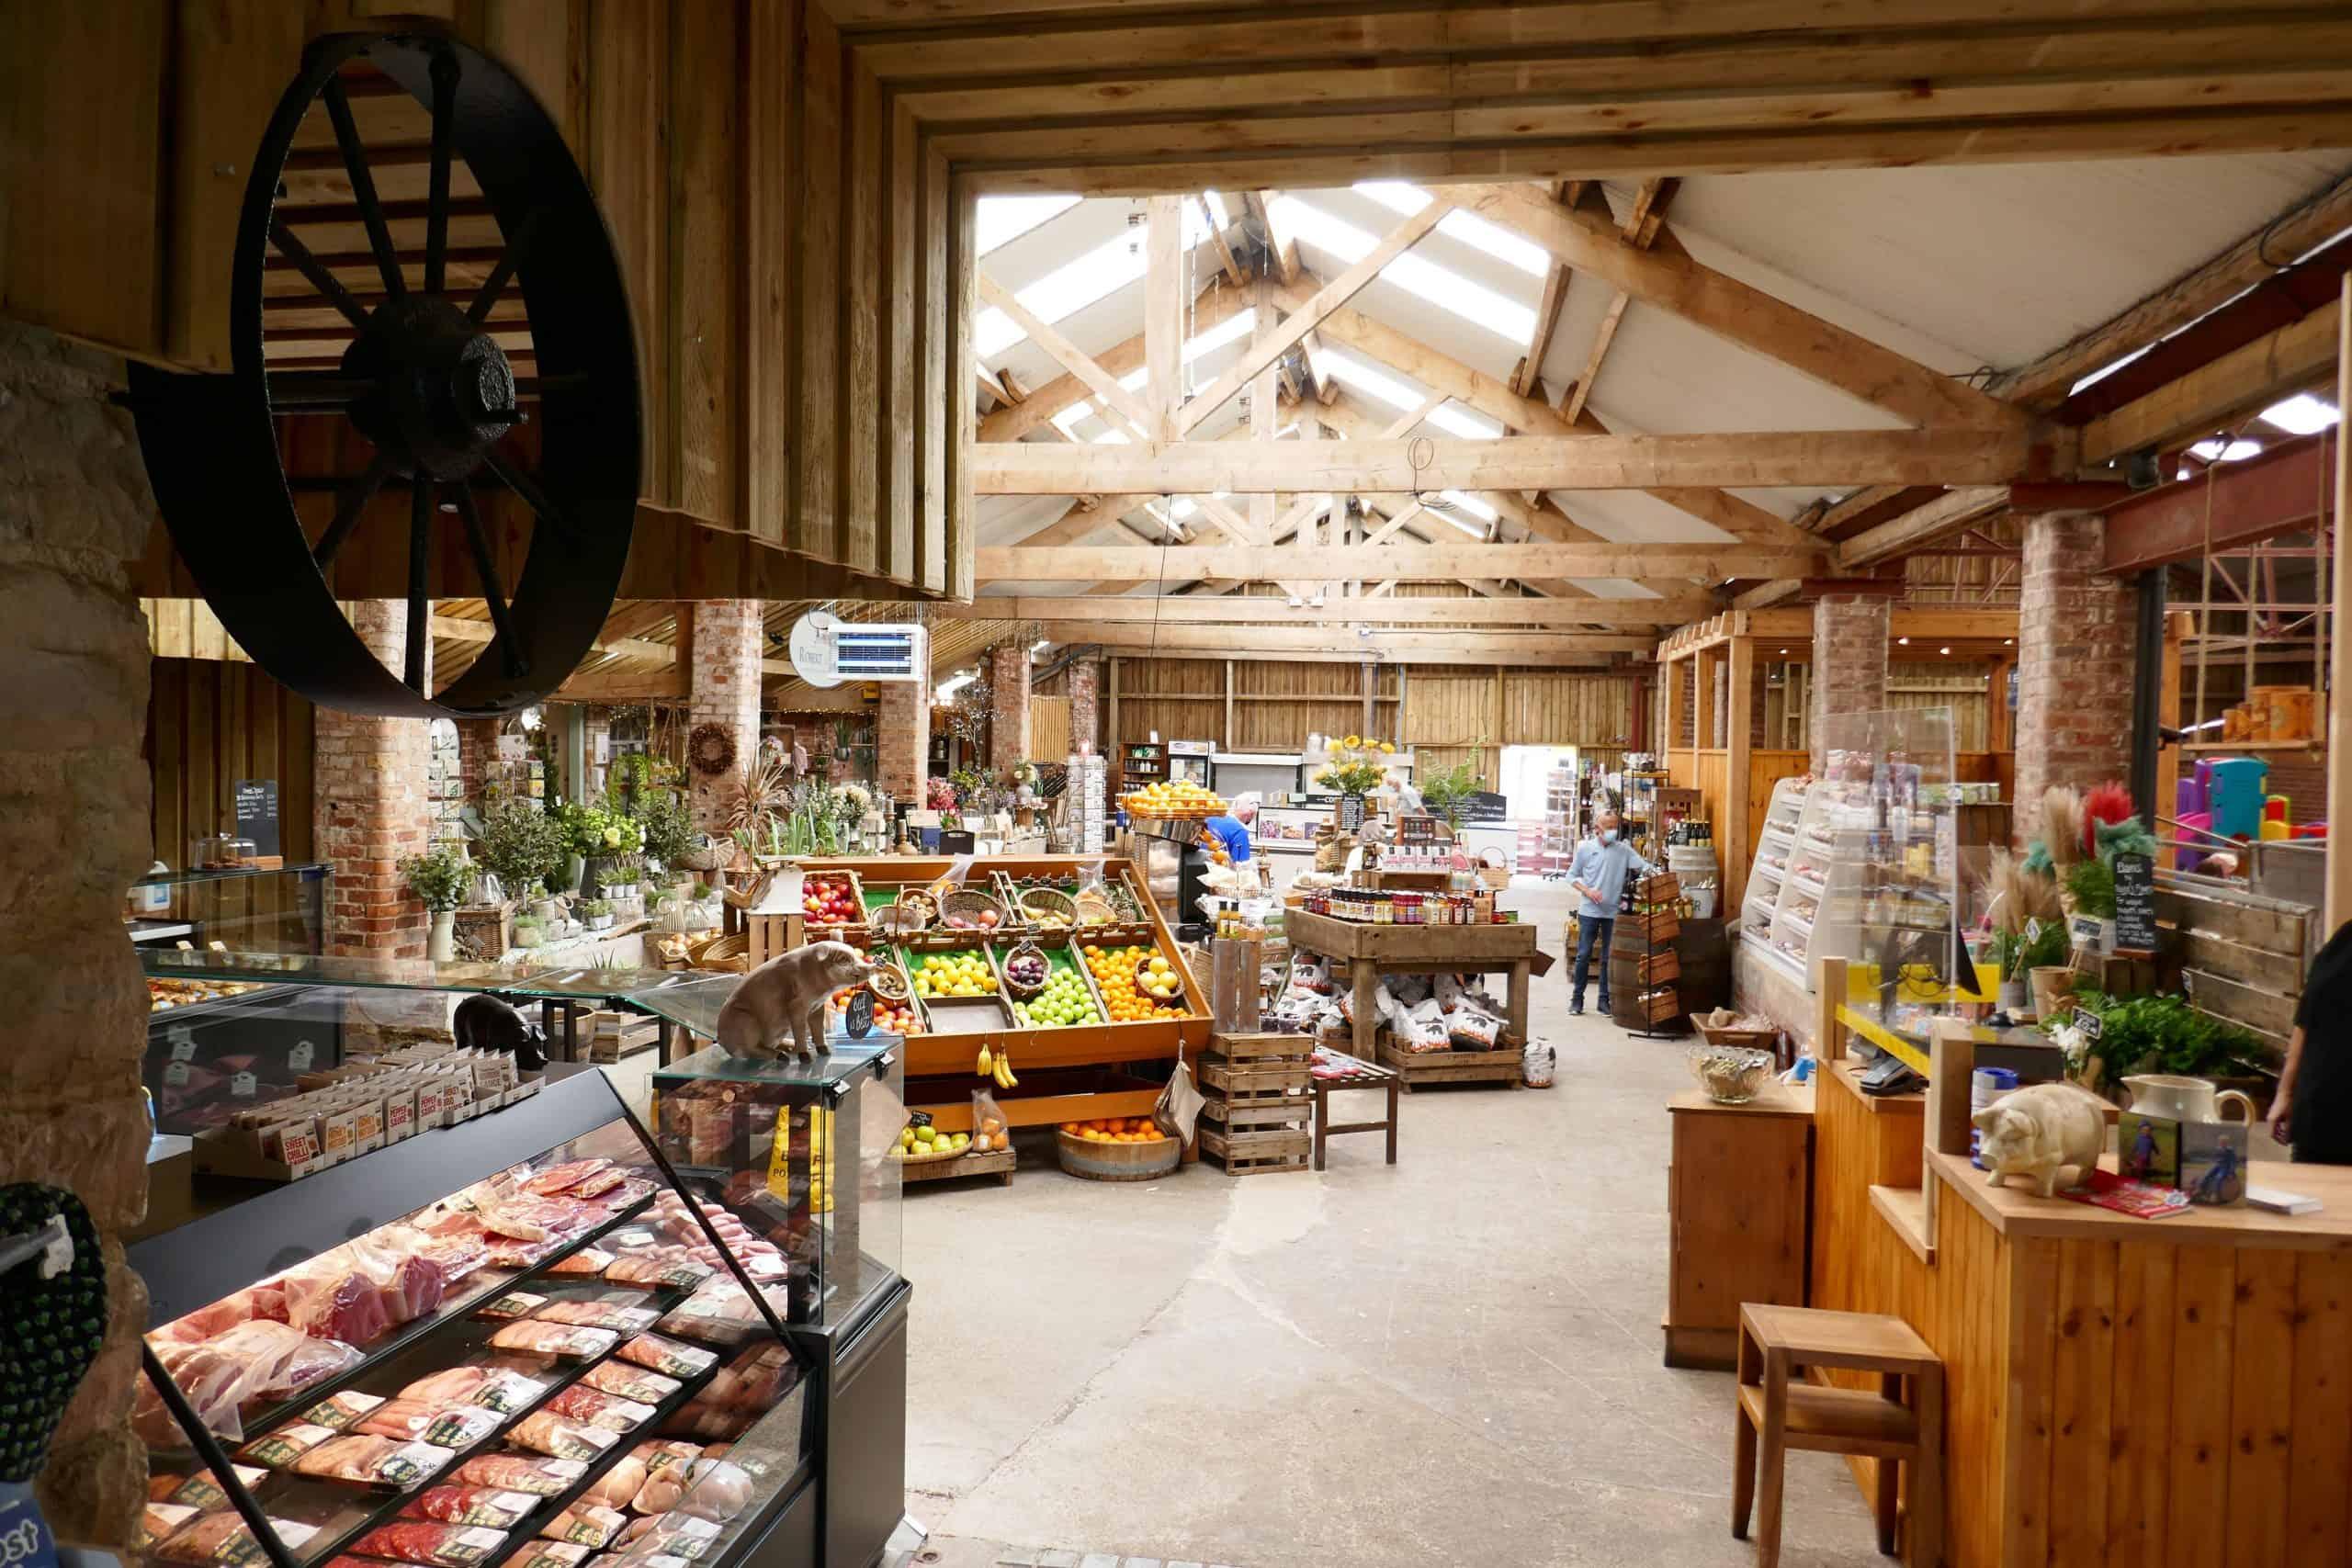 Farmshop and Delicatessen at Beadlam Grange